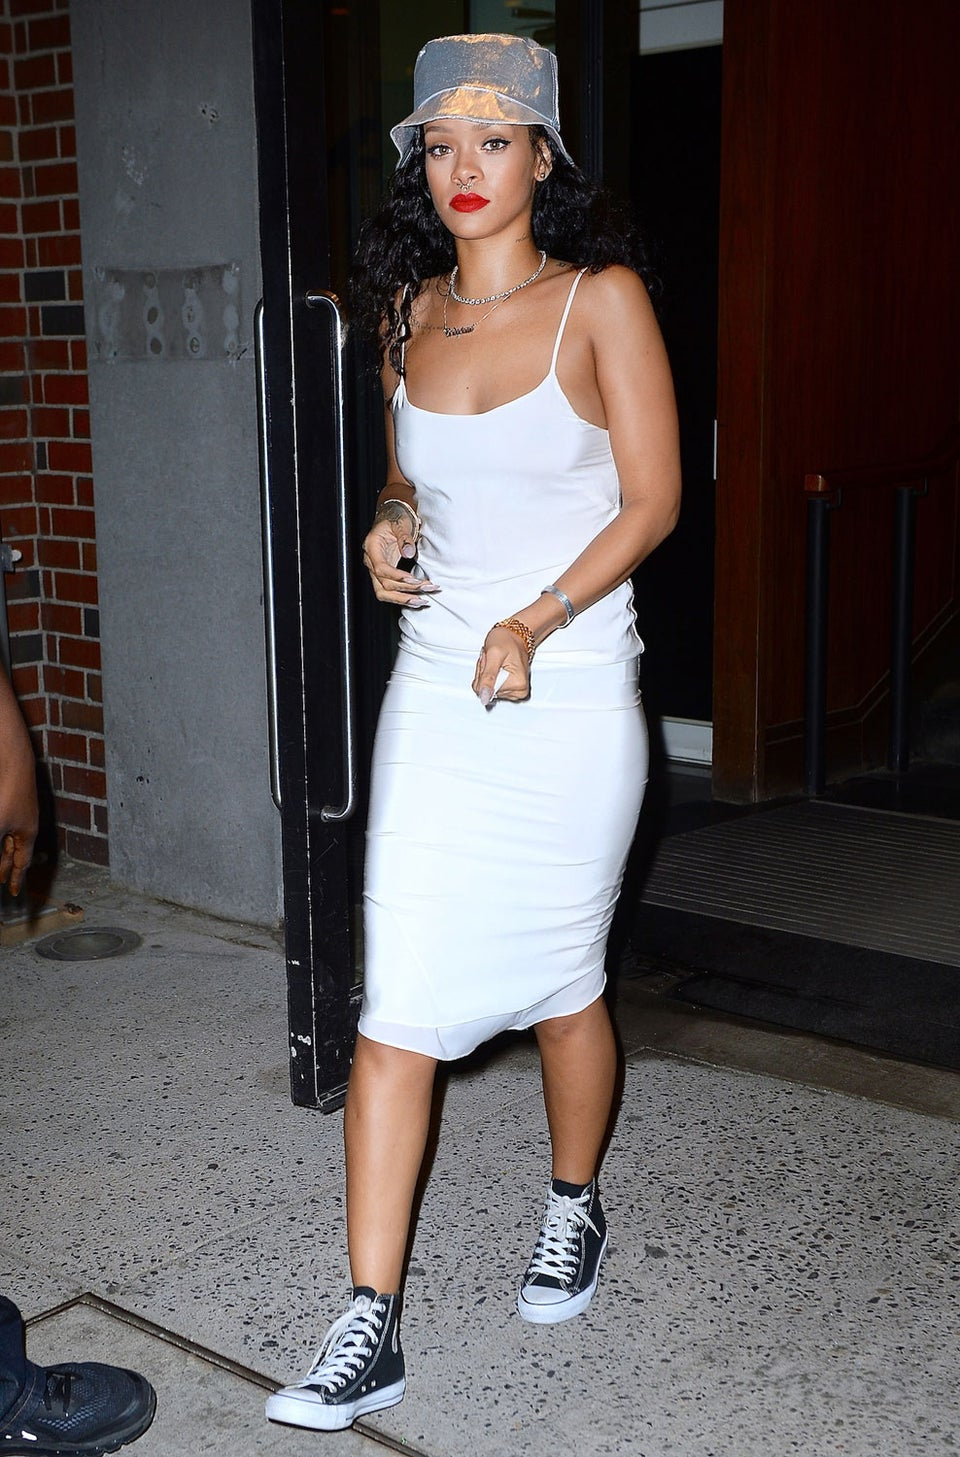 Rihanna's Stalker Arrested After Leaving Threatening Notes